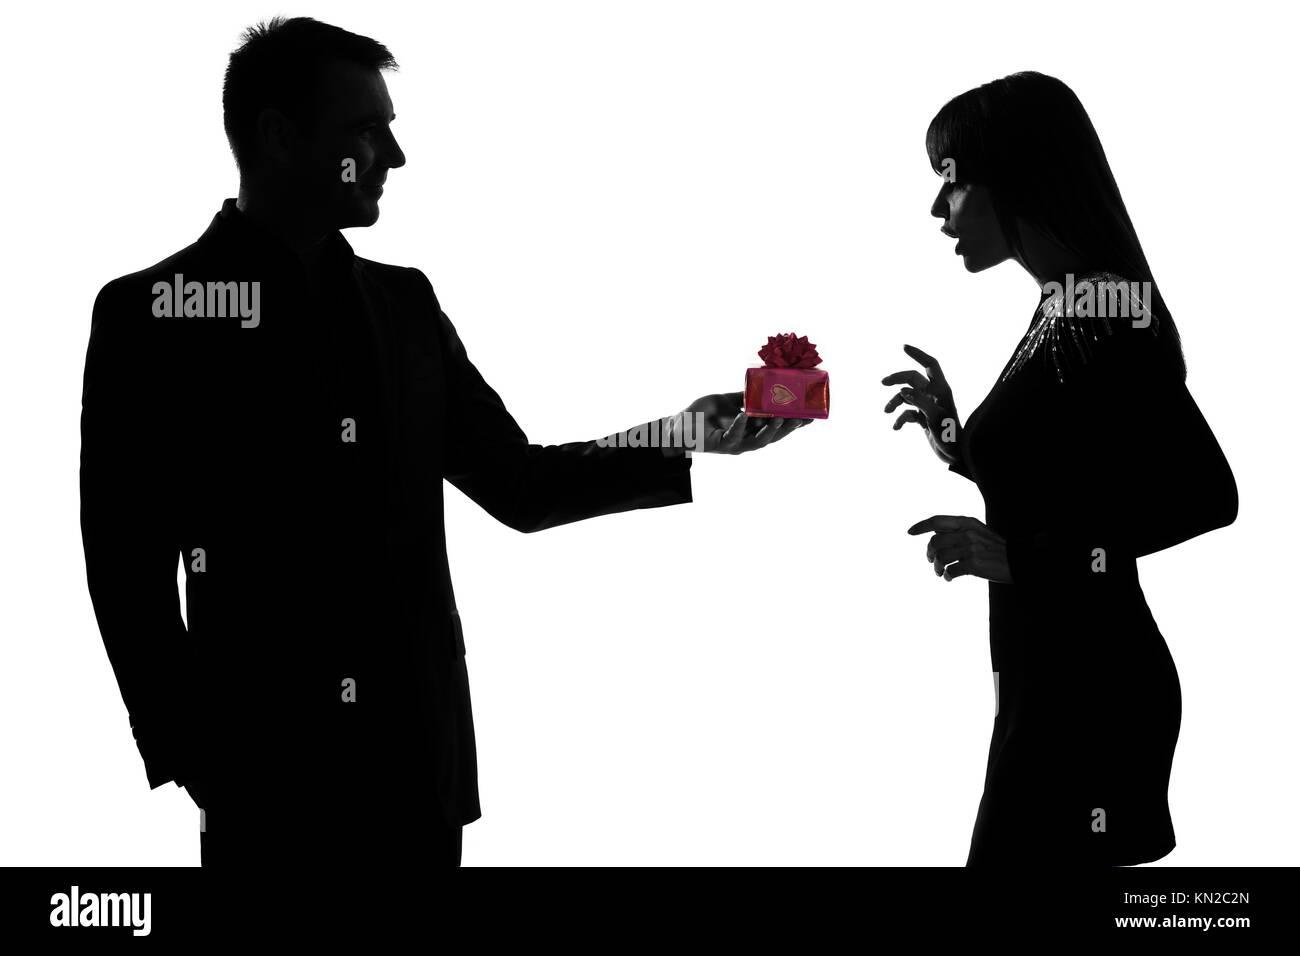 Flirt Gift Stockfotos & Flirt Gift Bilder - Seite 7 - Alamy